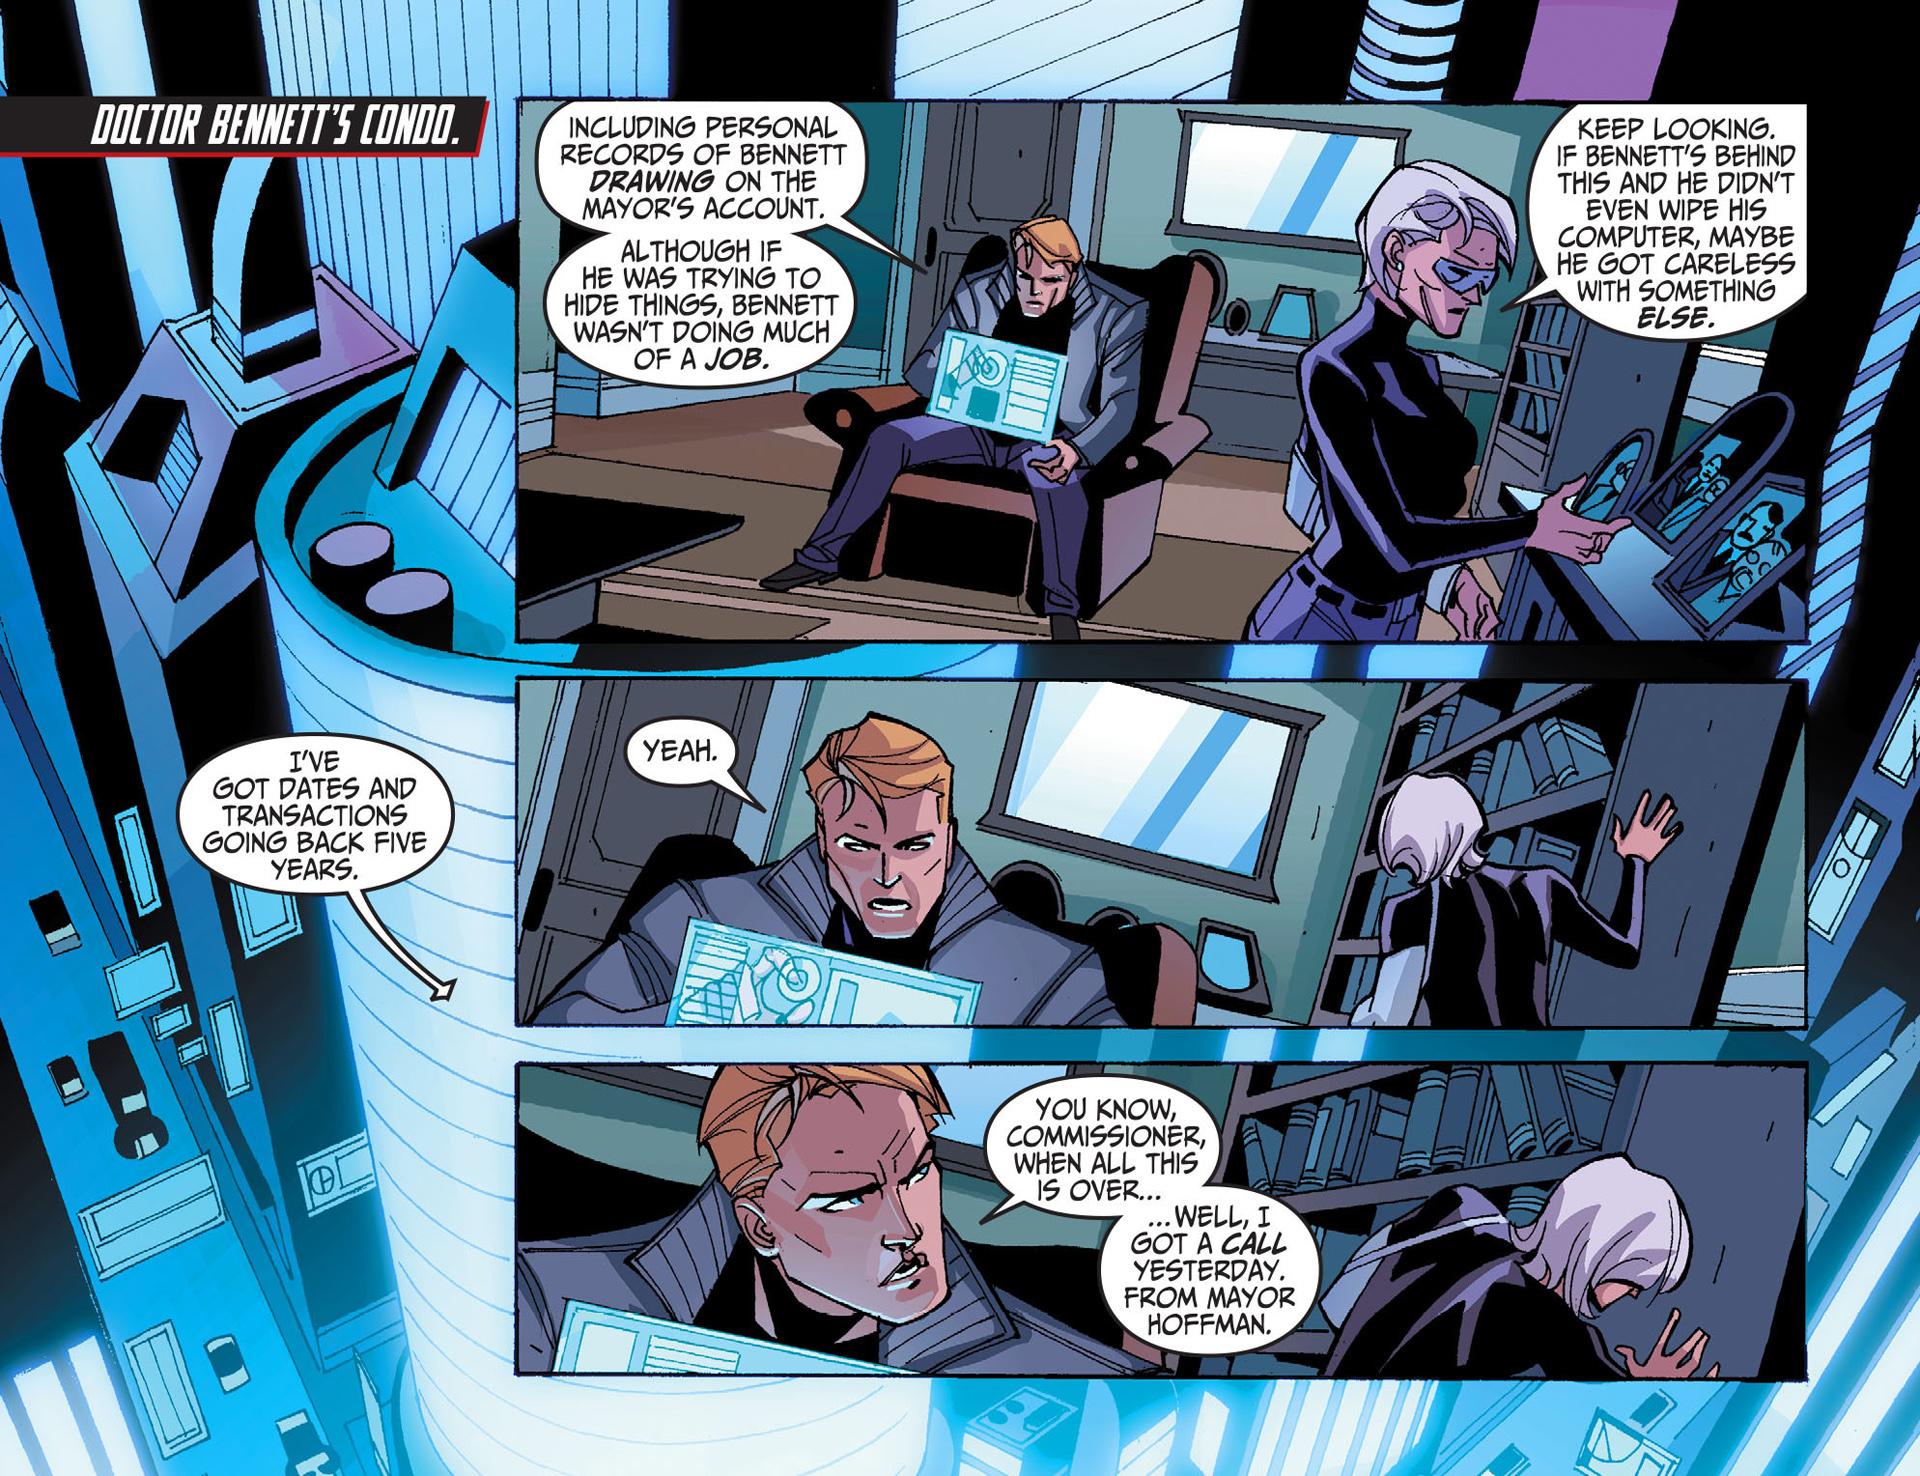 Batman Beyond 2.0 Issue #5 #5 - English 11